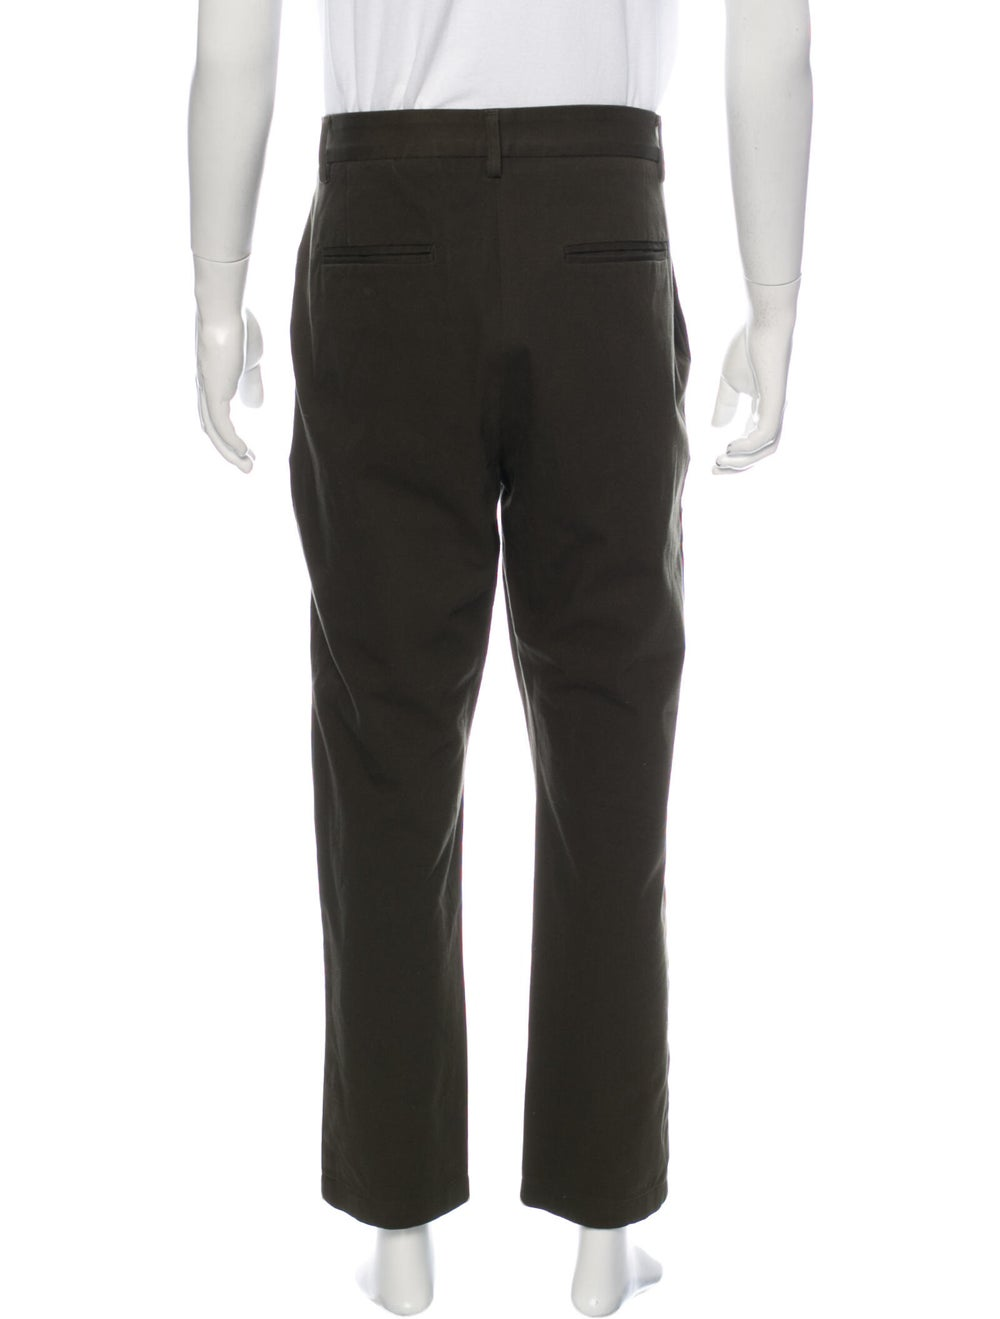 Arcady Pants Green - image 3